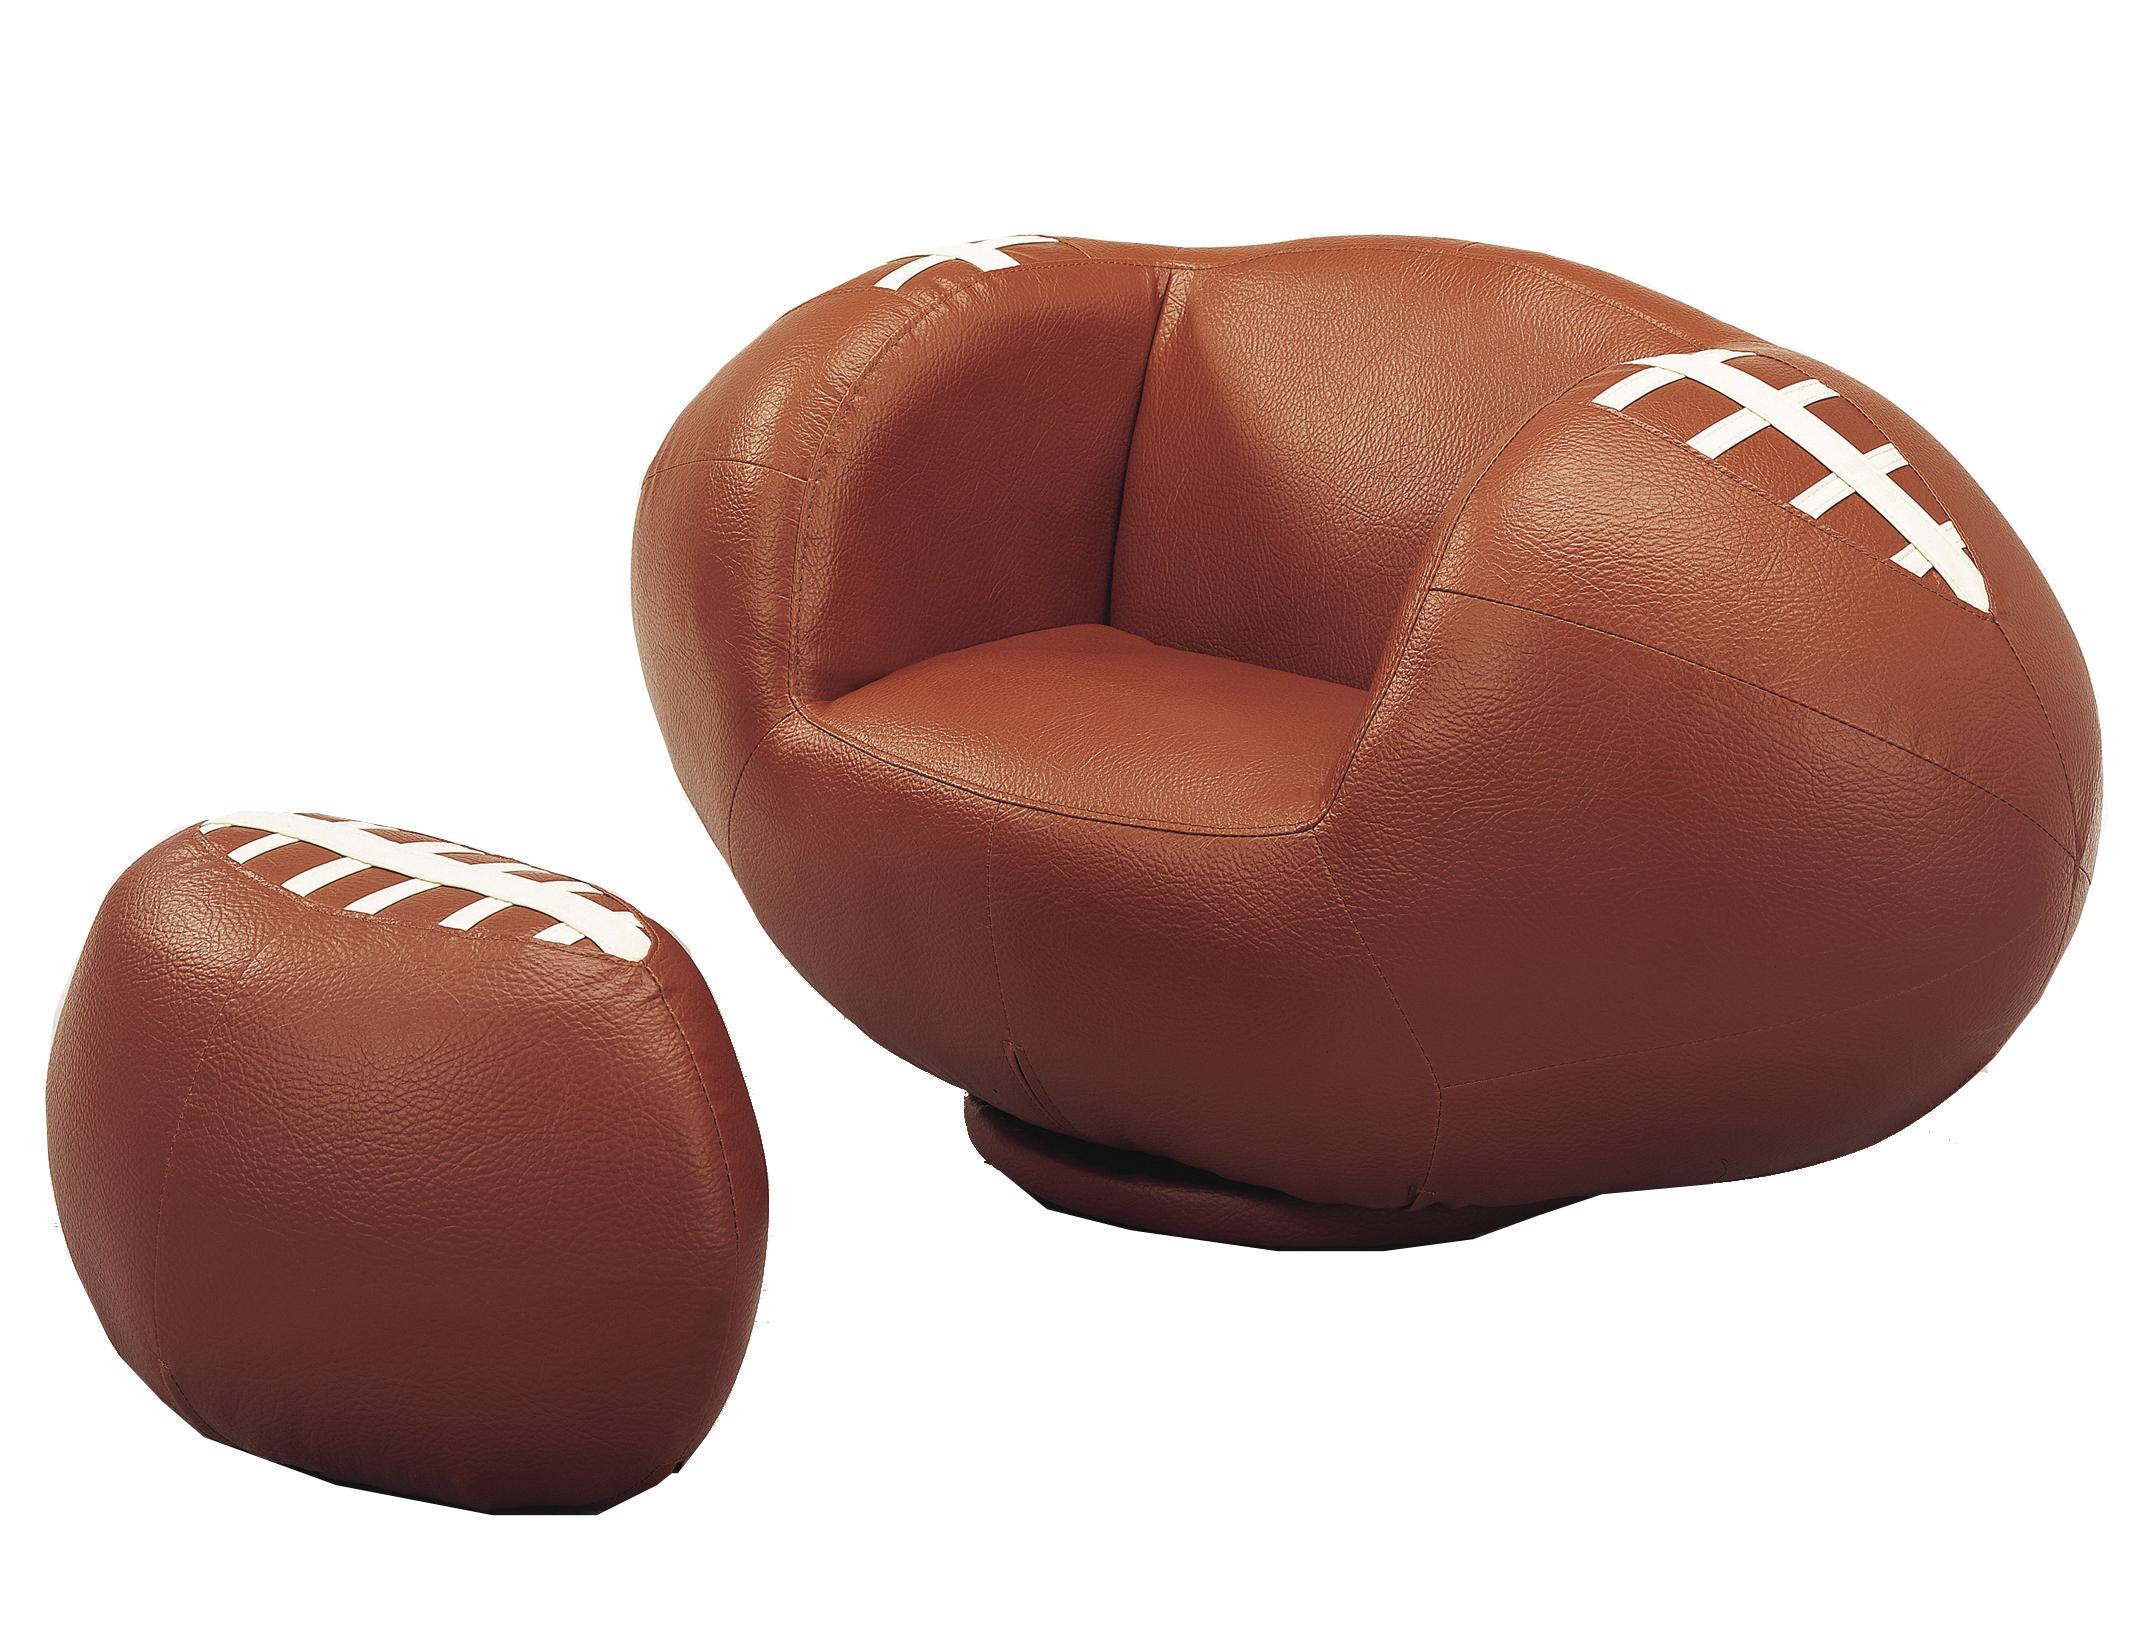 Crown Mark Kids Sport Chairs Football Swivel Chair U0026 Ottoman